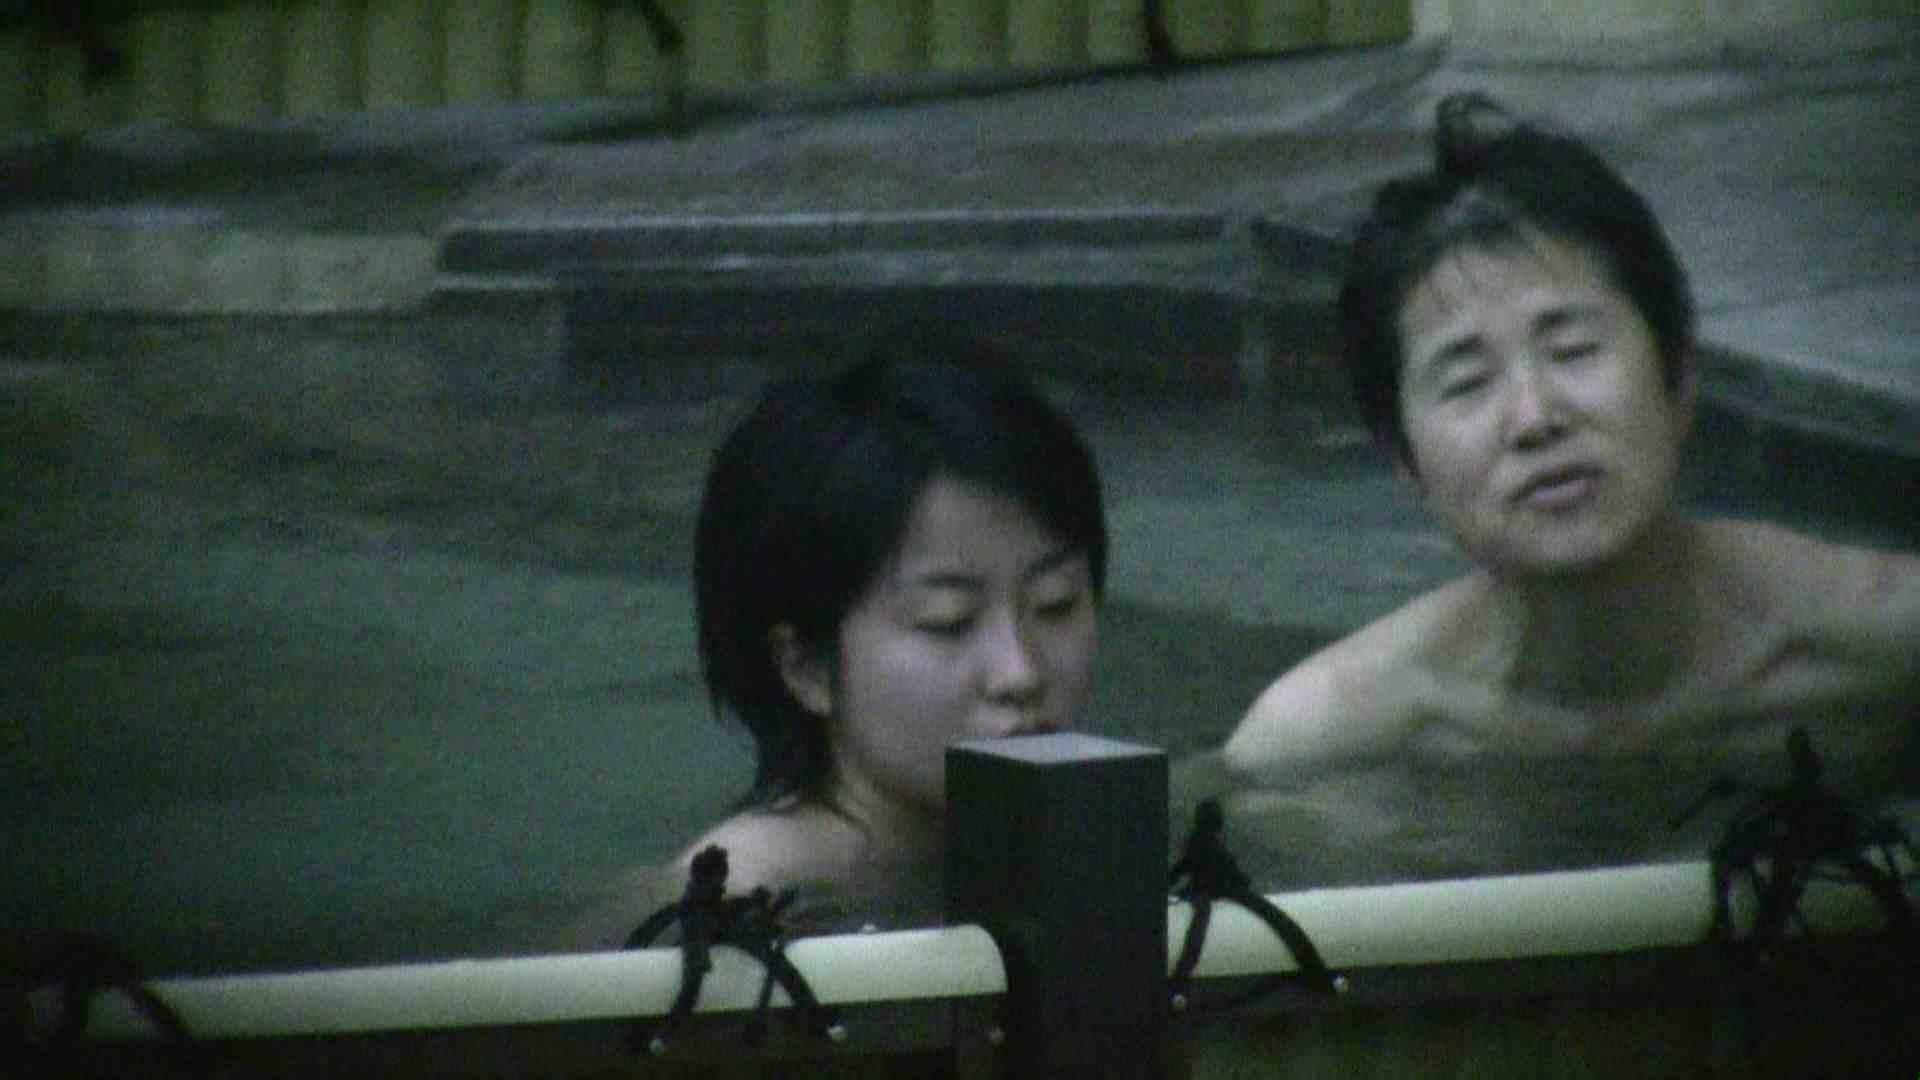 Aquaな露天風呂Vol.112 0 | 0  68連発 25